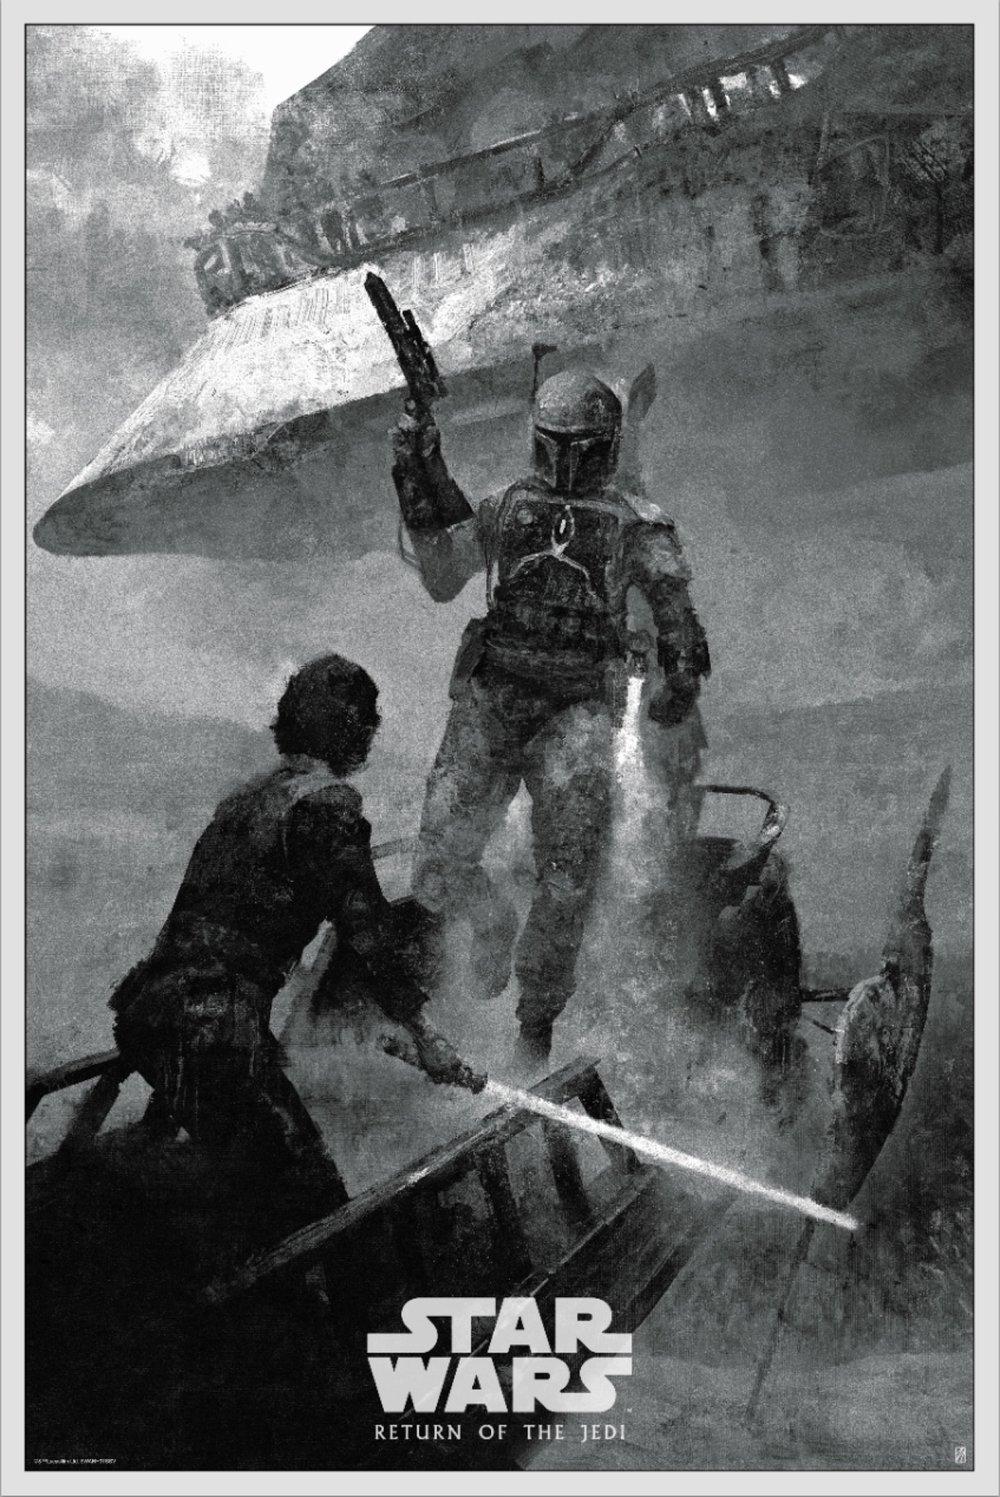 Karl-Fitzgerald-22Skywalker-Returns-Return-of-the-Jedi-Variant22-Screen-print.jpg